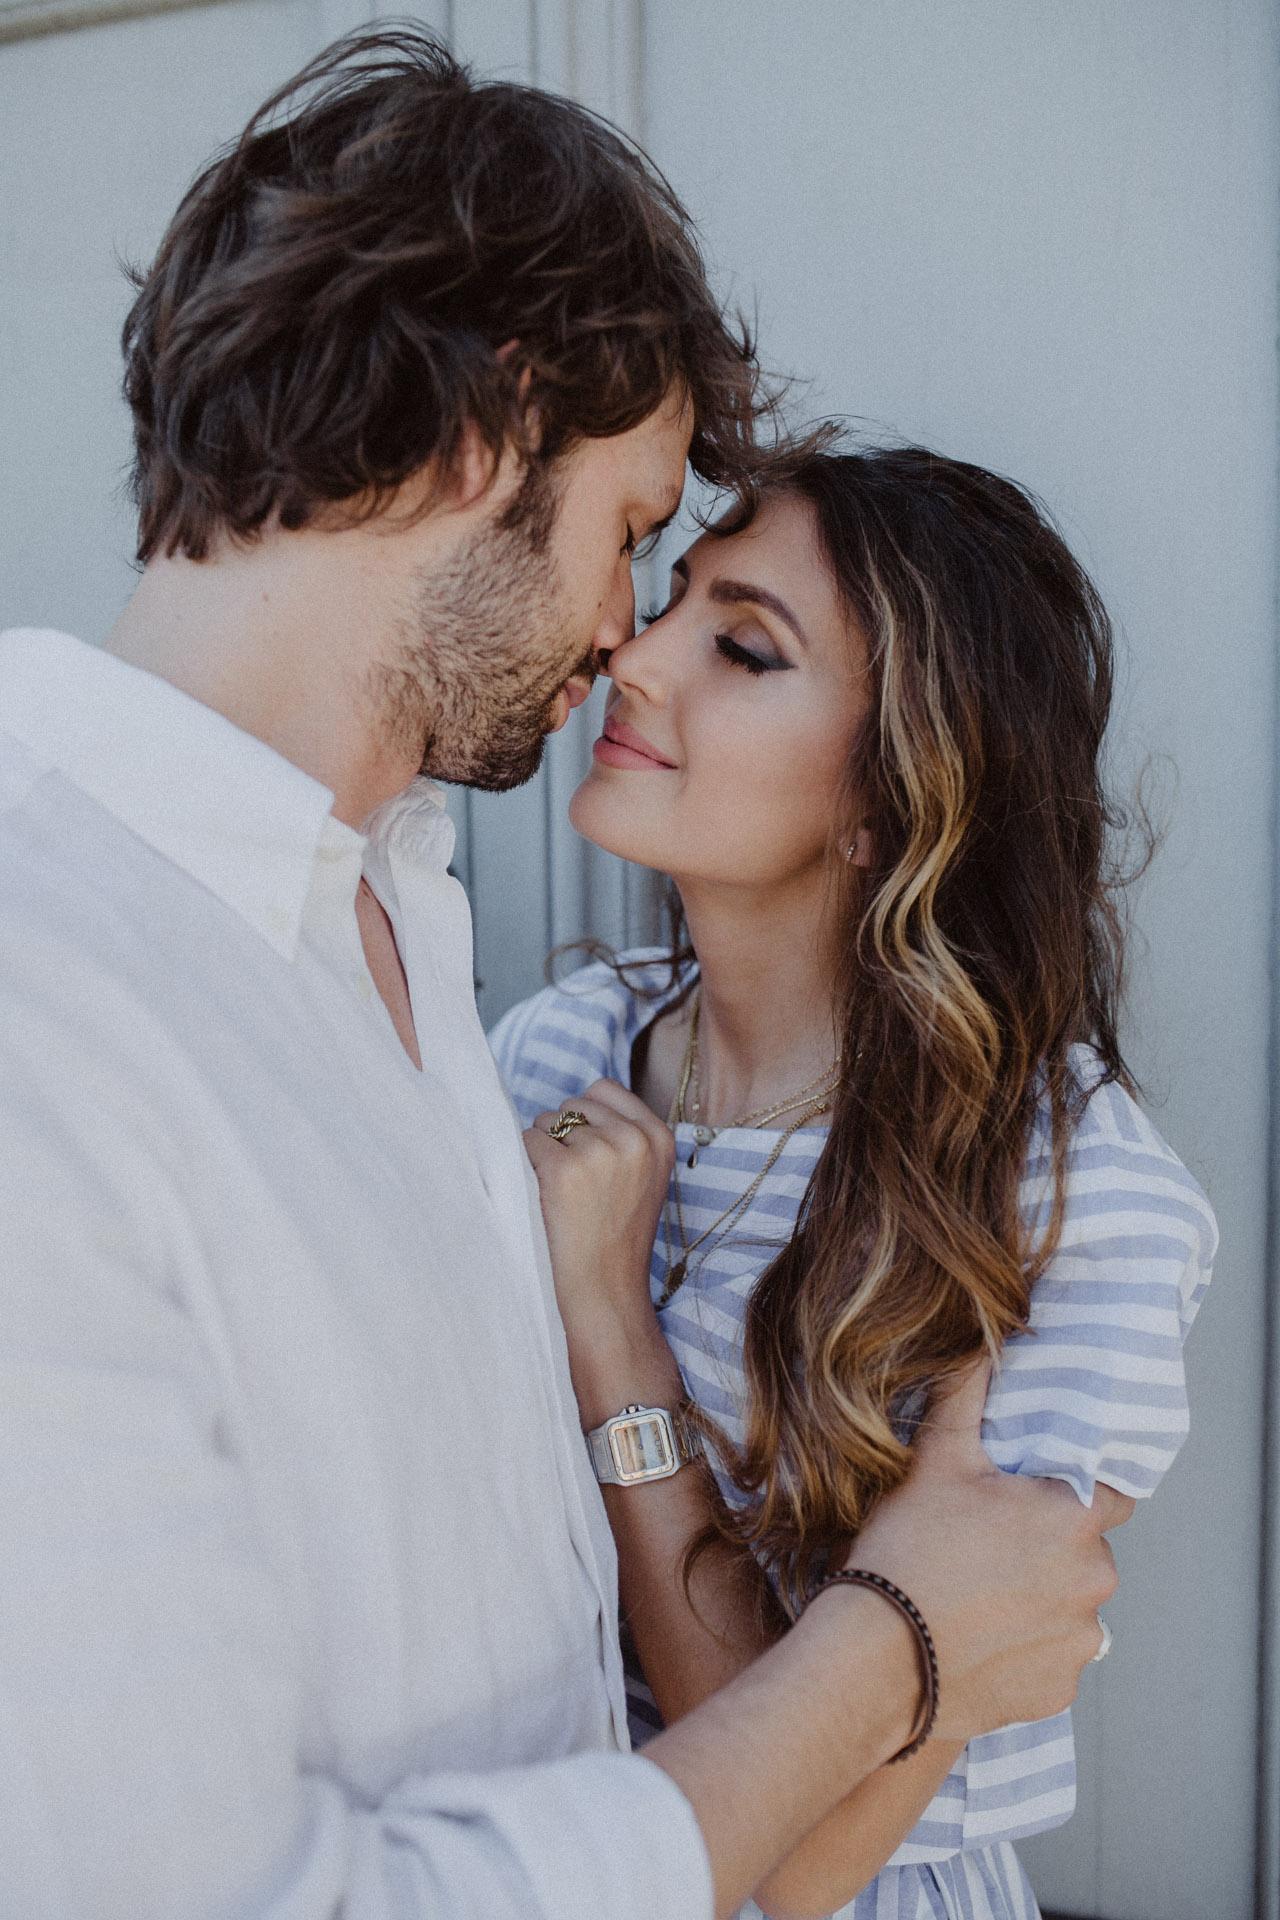 coupleshooting-roma-hochzeitsfotografen-wien-agnesundandi-7